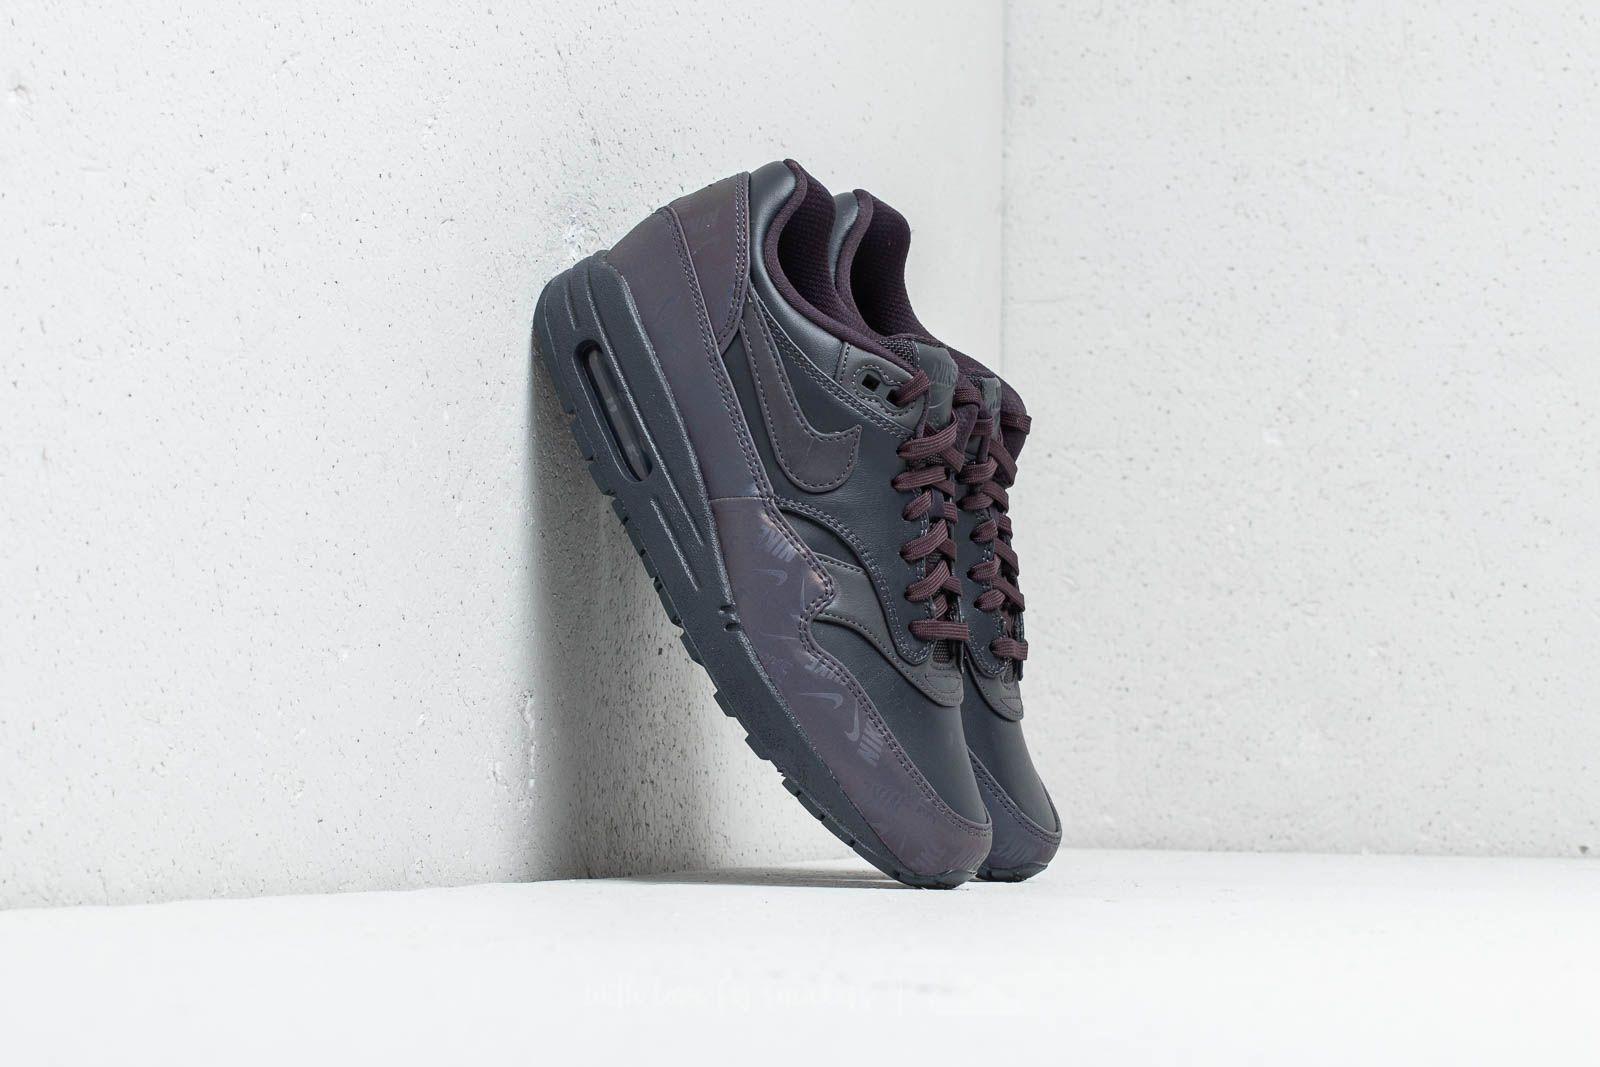 c1307b81315 Nike WMNS Air Max 1 LX Oil Grey  Oil Grey-Oil Grey at a